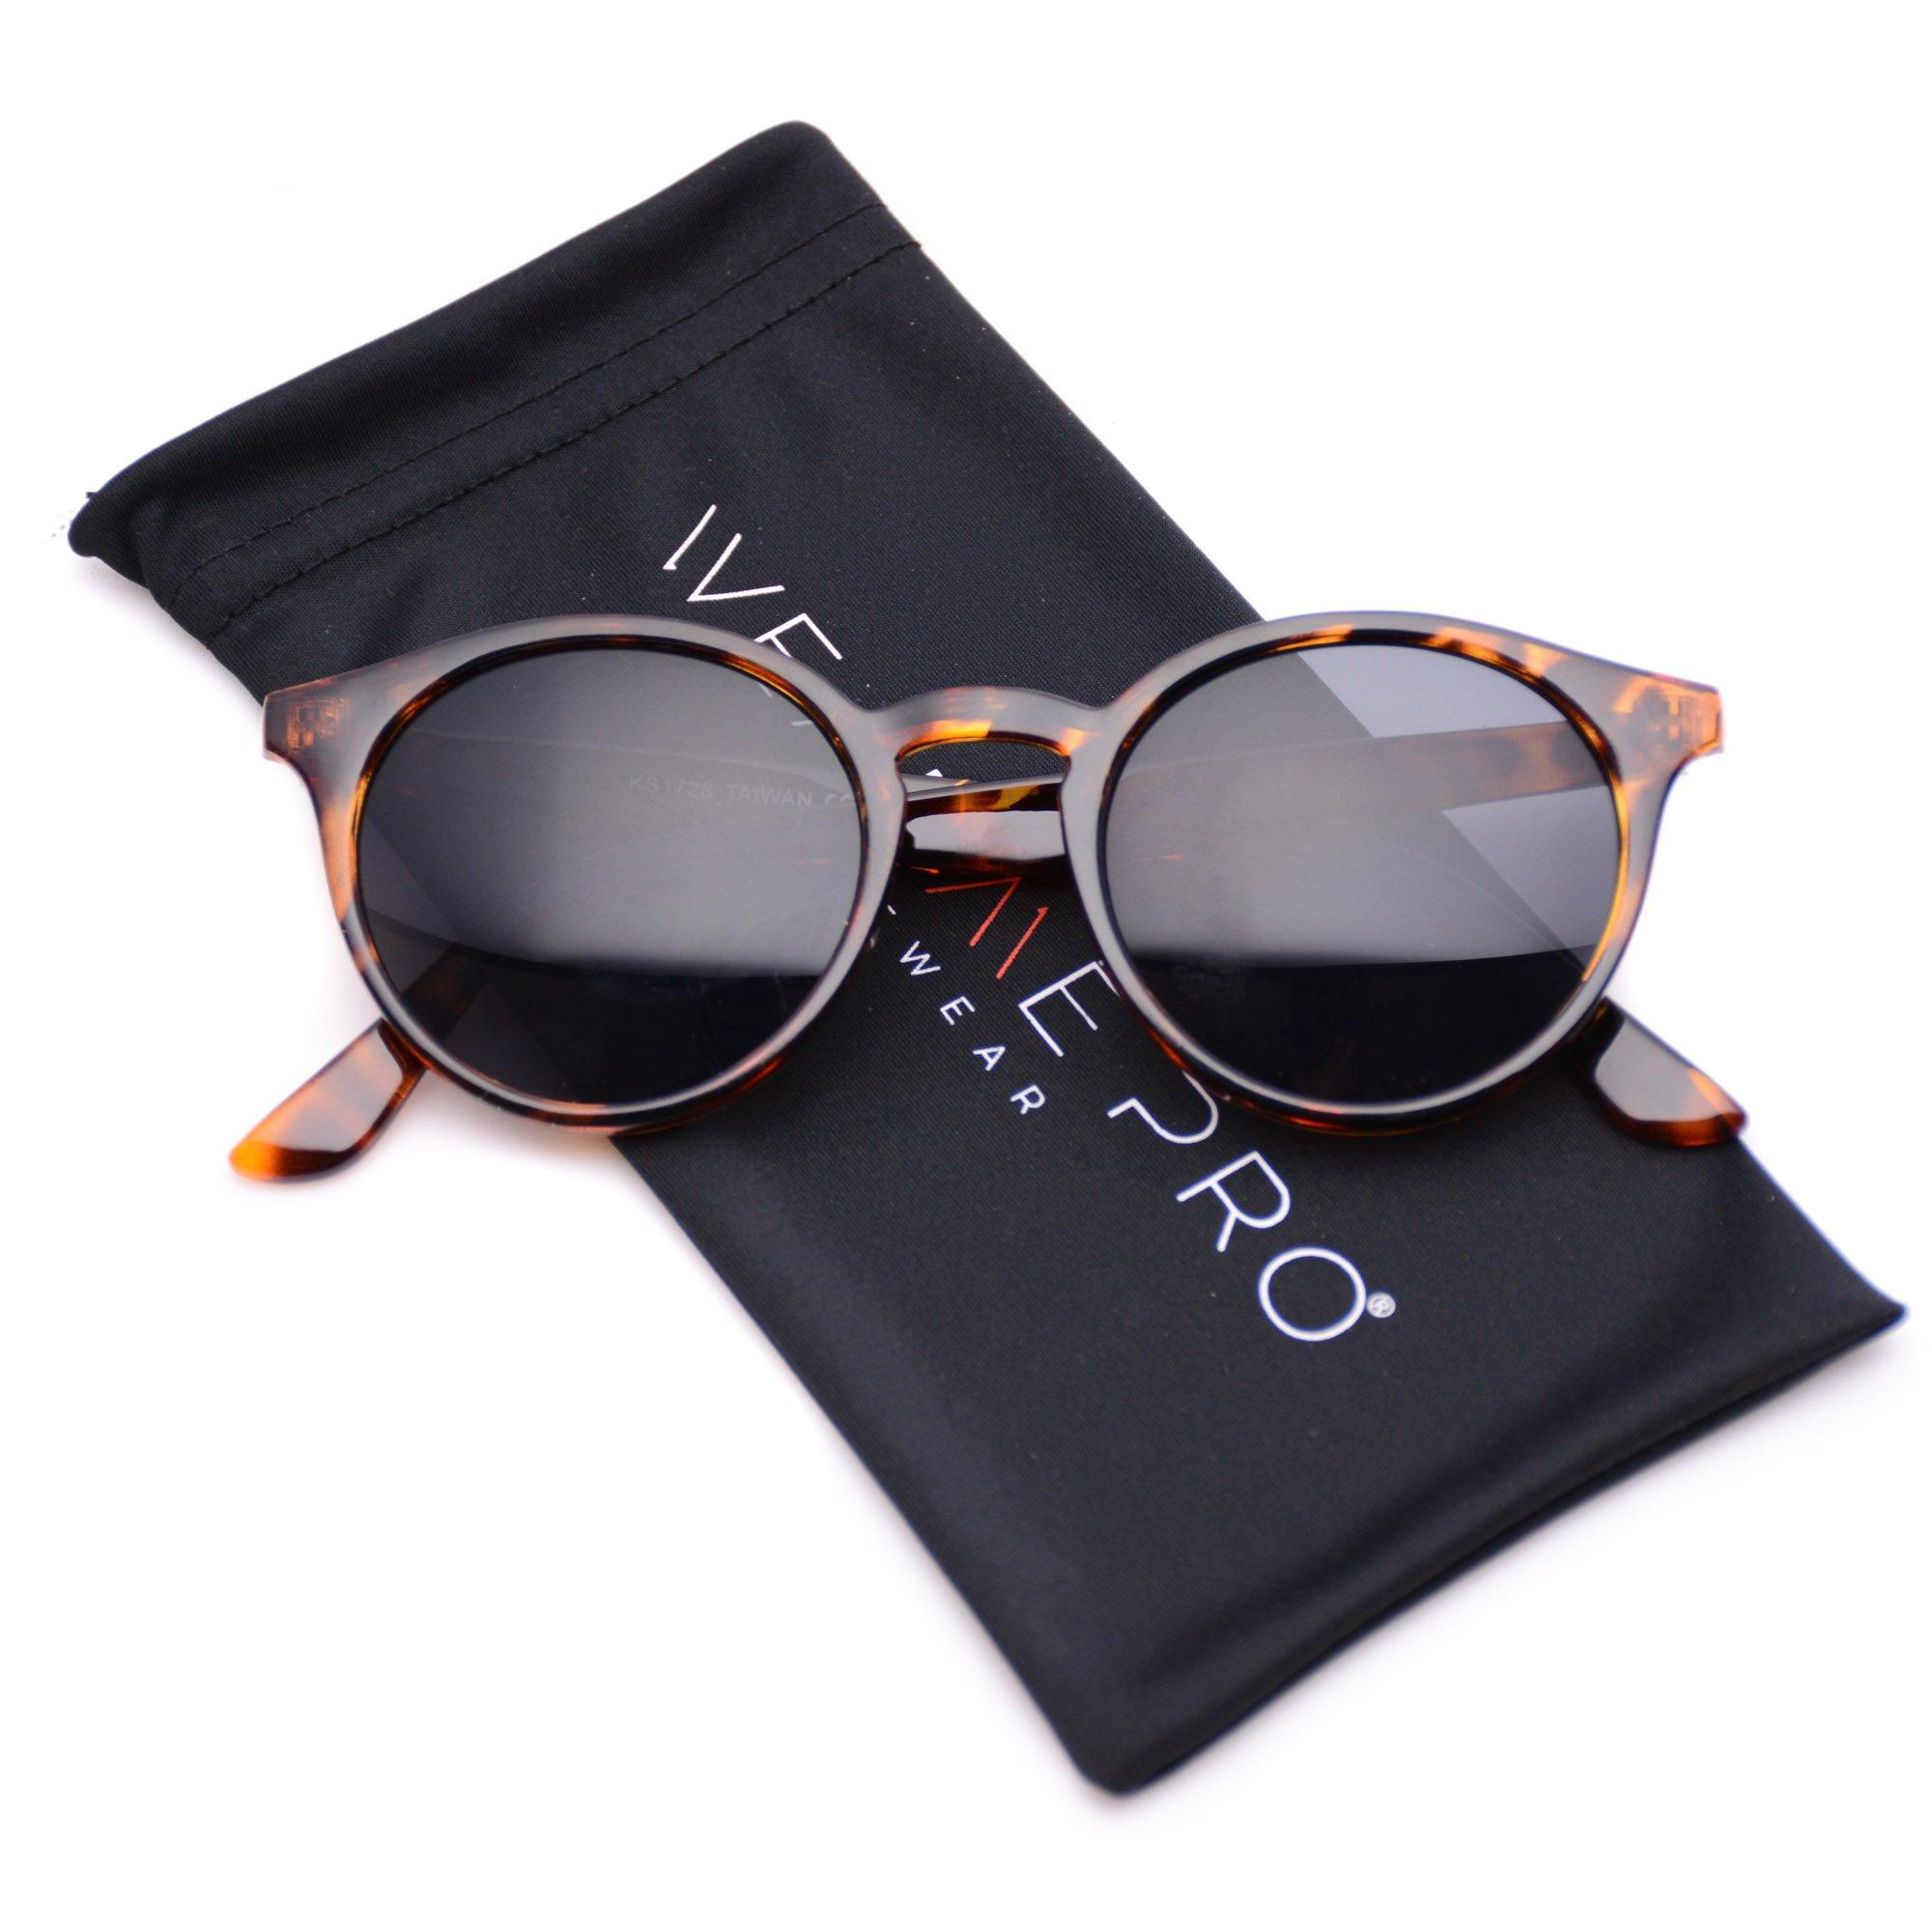 WearMe Pro Classic Small Round Retro Sunglasses, Tortoise Frame/Black Lens